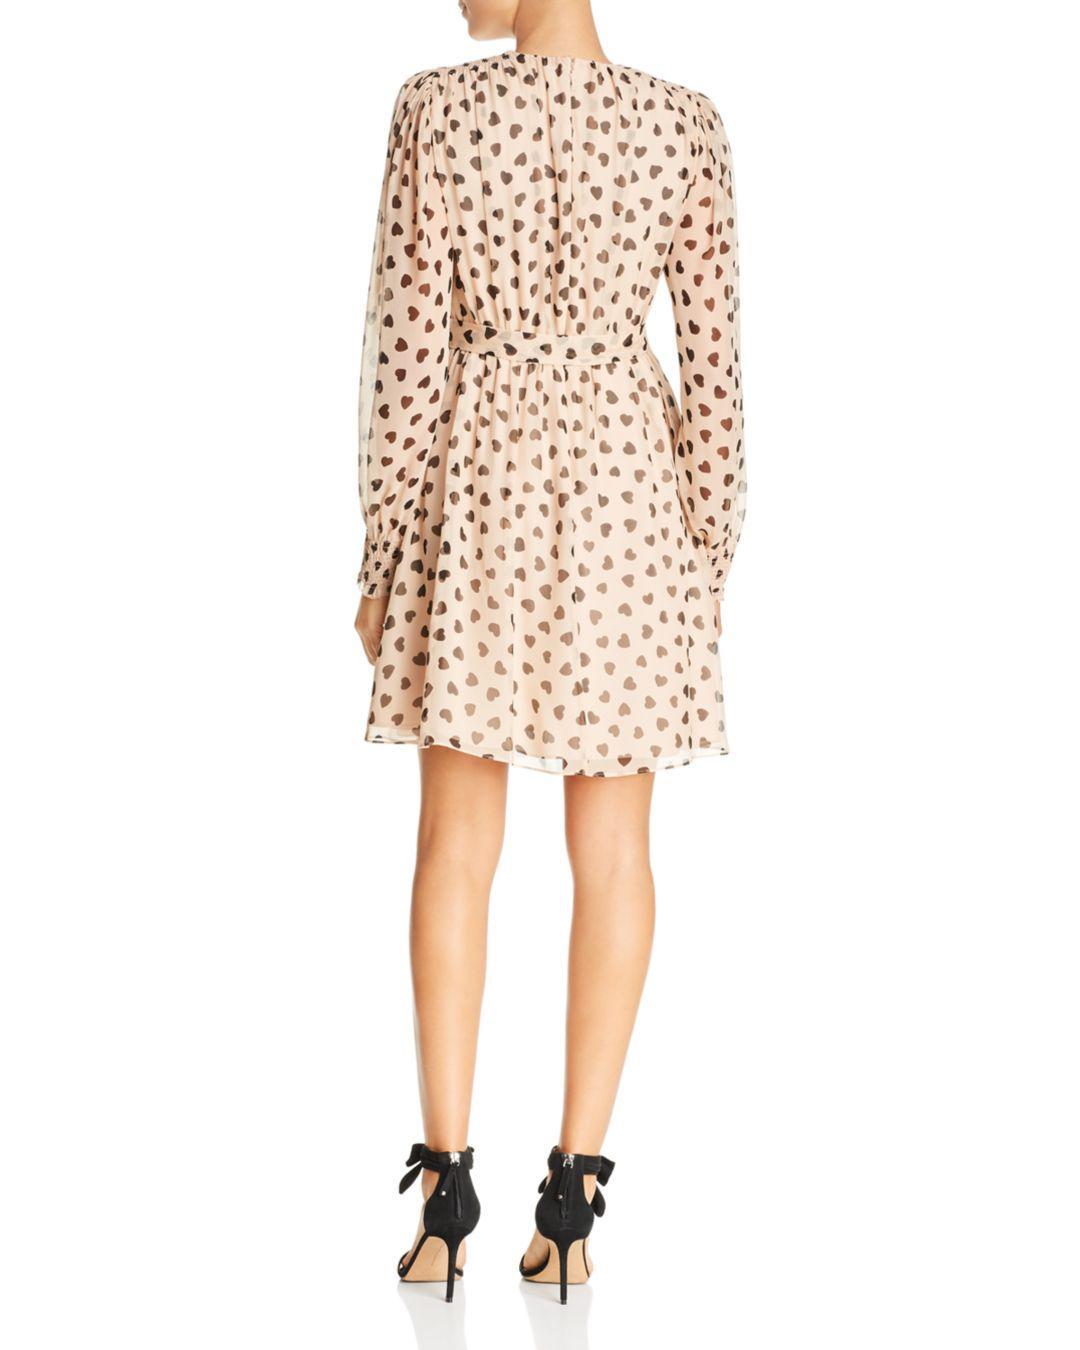 a6ec6968d098 Kate Spade Heart It Heartbeat Silk Mini Dress (roasted Peanut) Dress in  Natural - Lyst